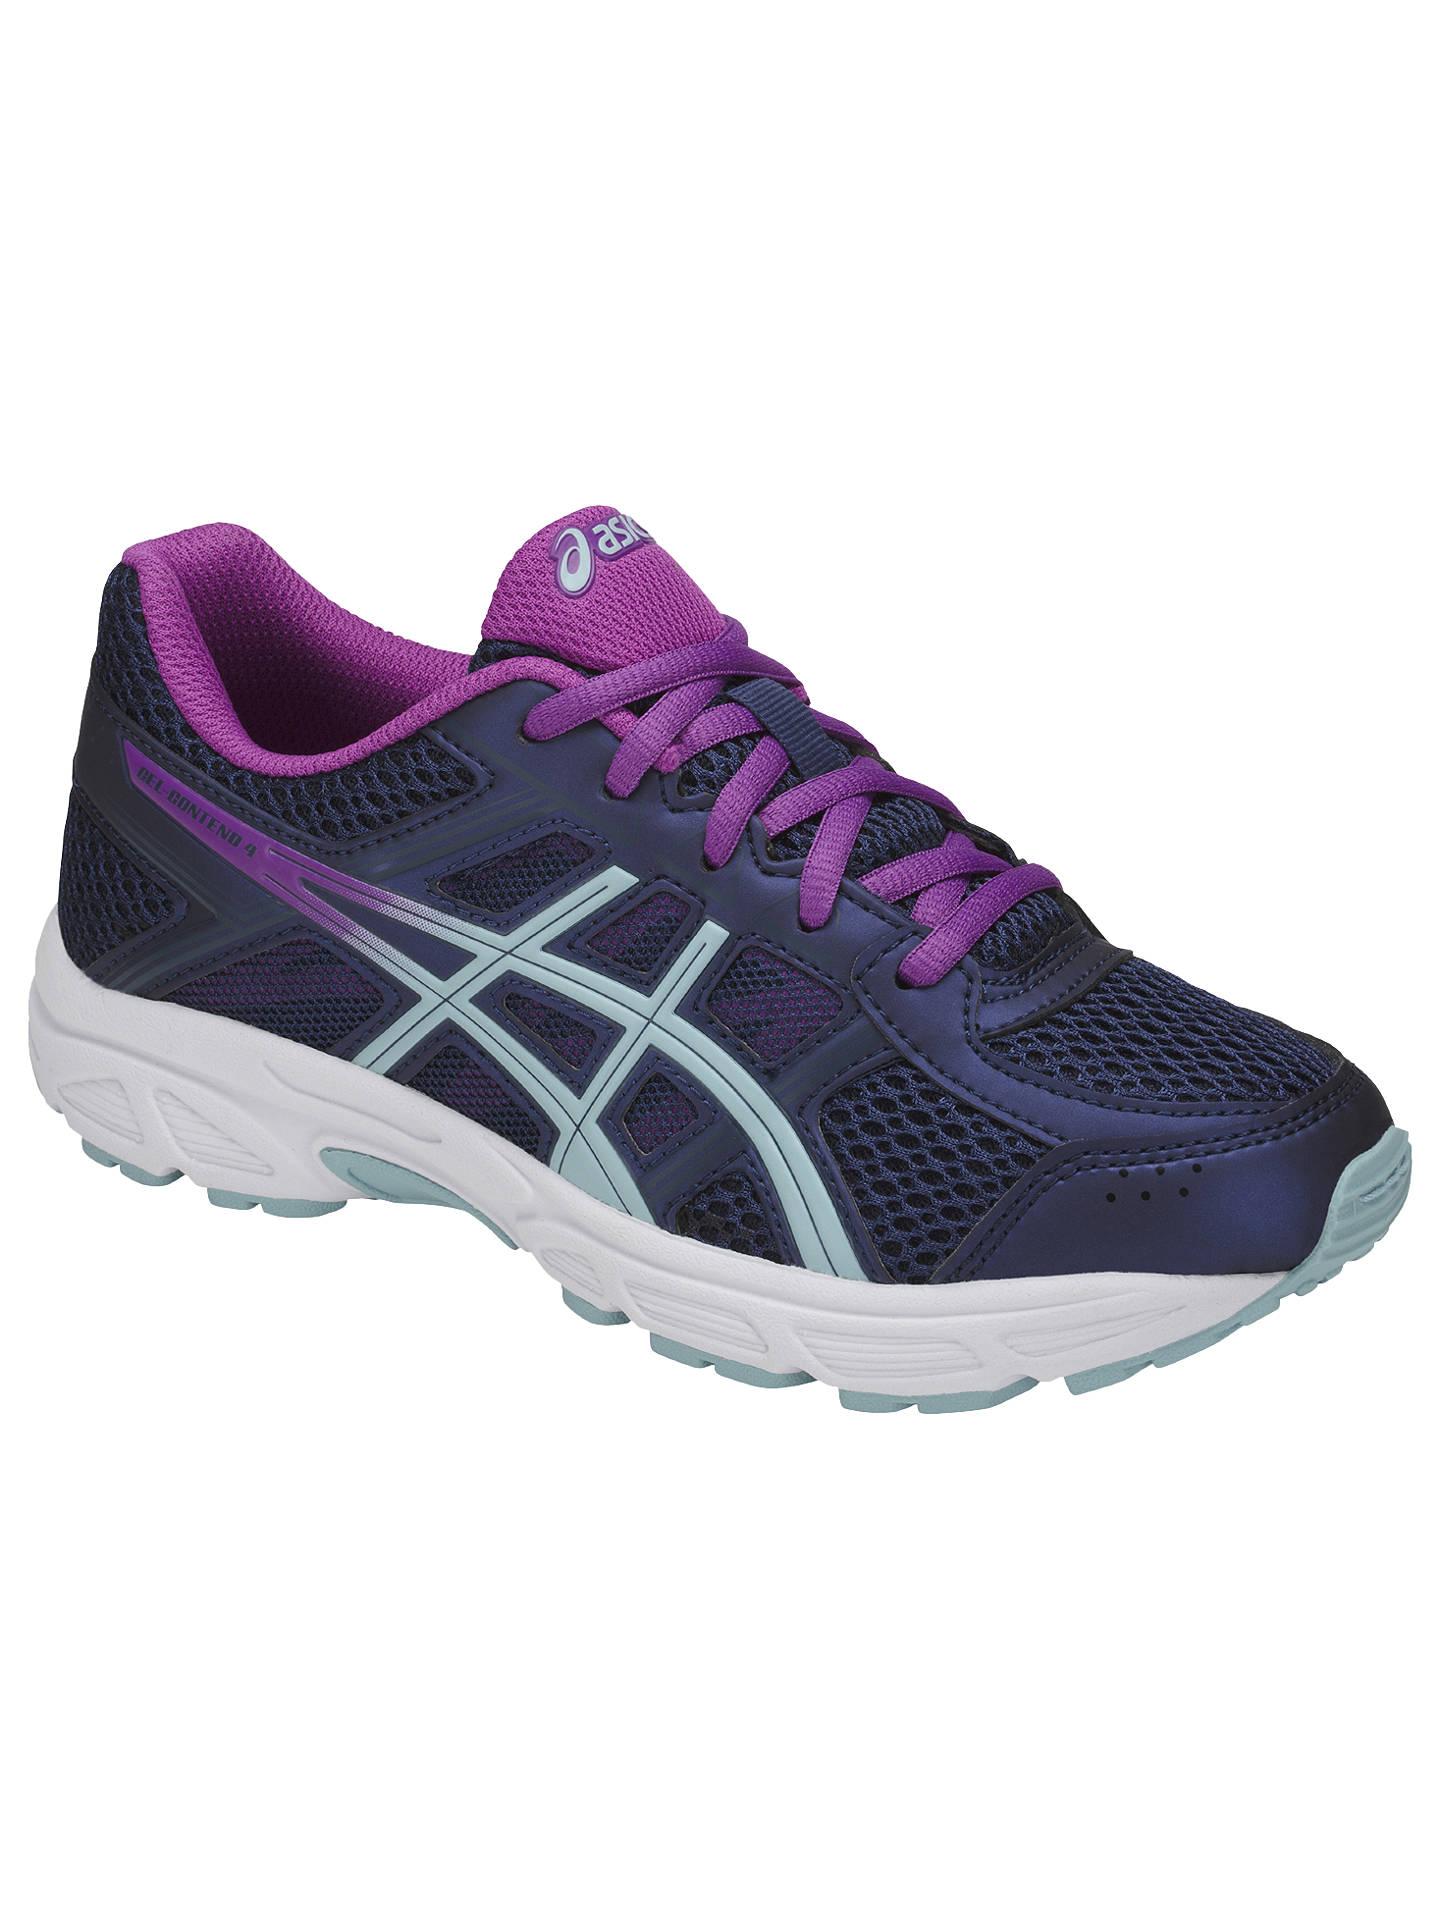 ASICS Womens Gel Contend 3 Mesh Lace Up Running